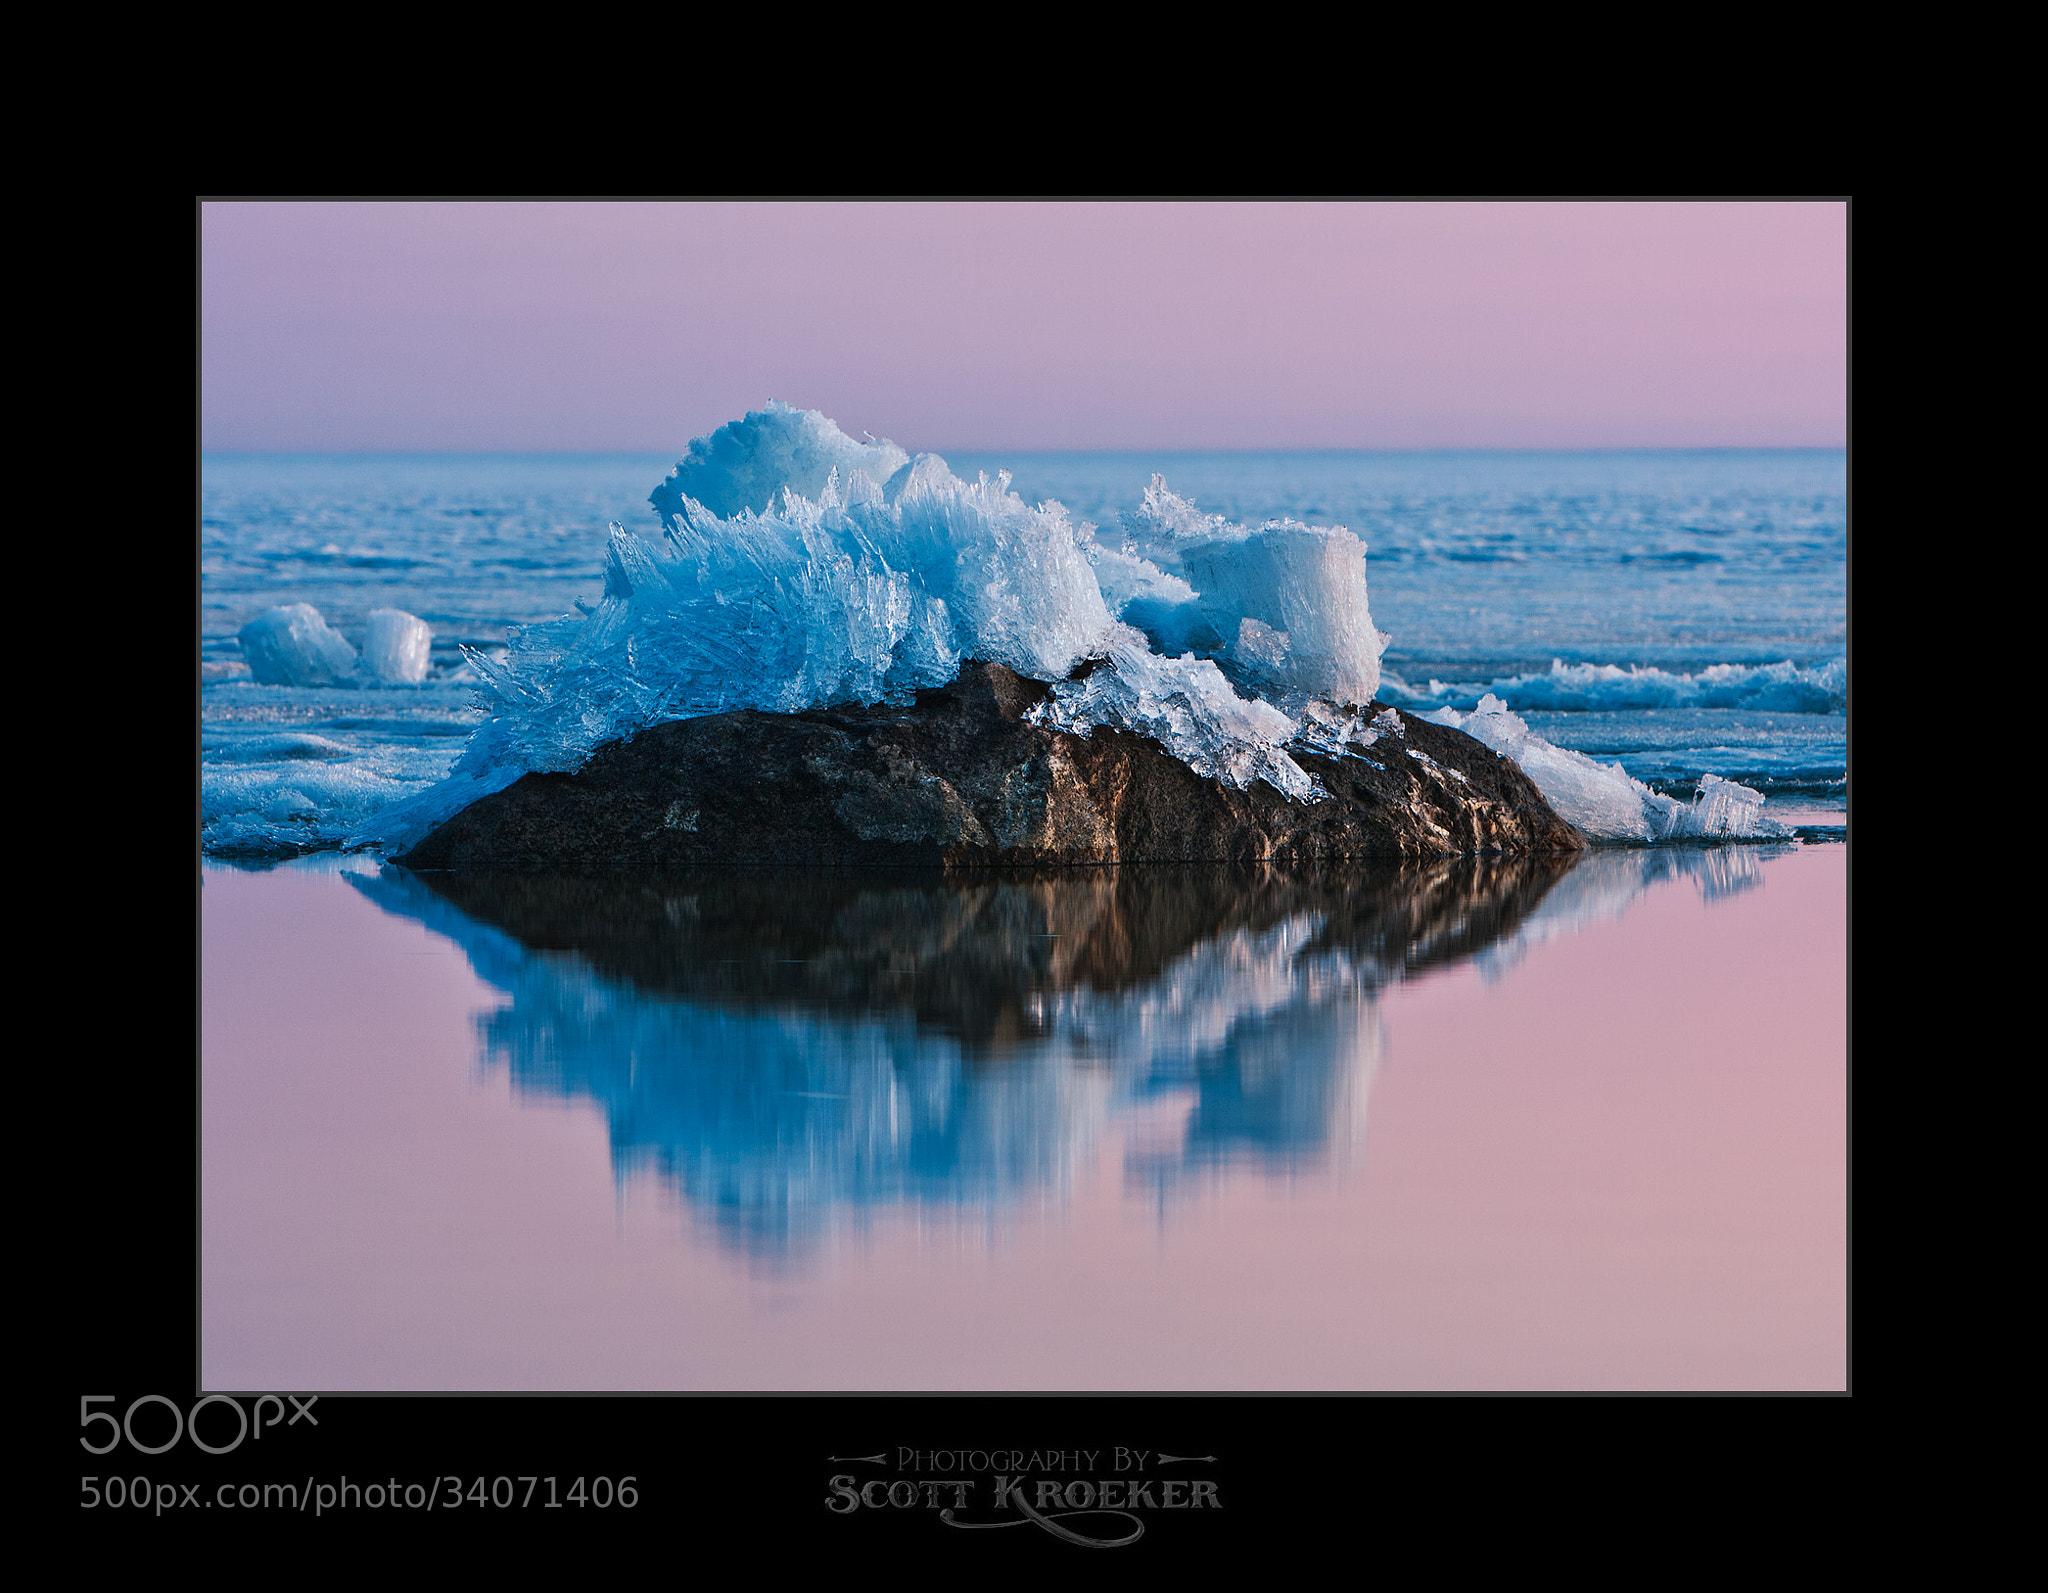 Photograph Lake Ice VS Immovable Rocks II by Scott Kroeker on 500px